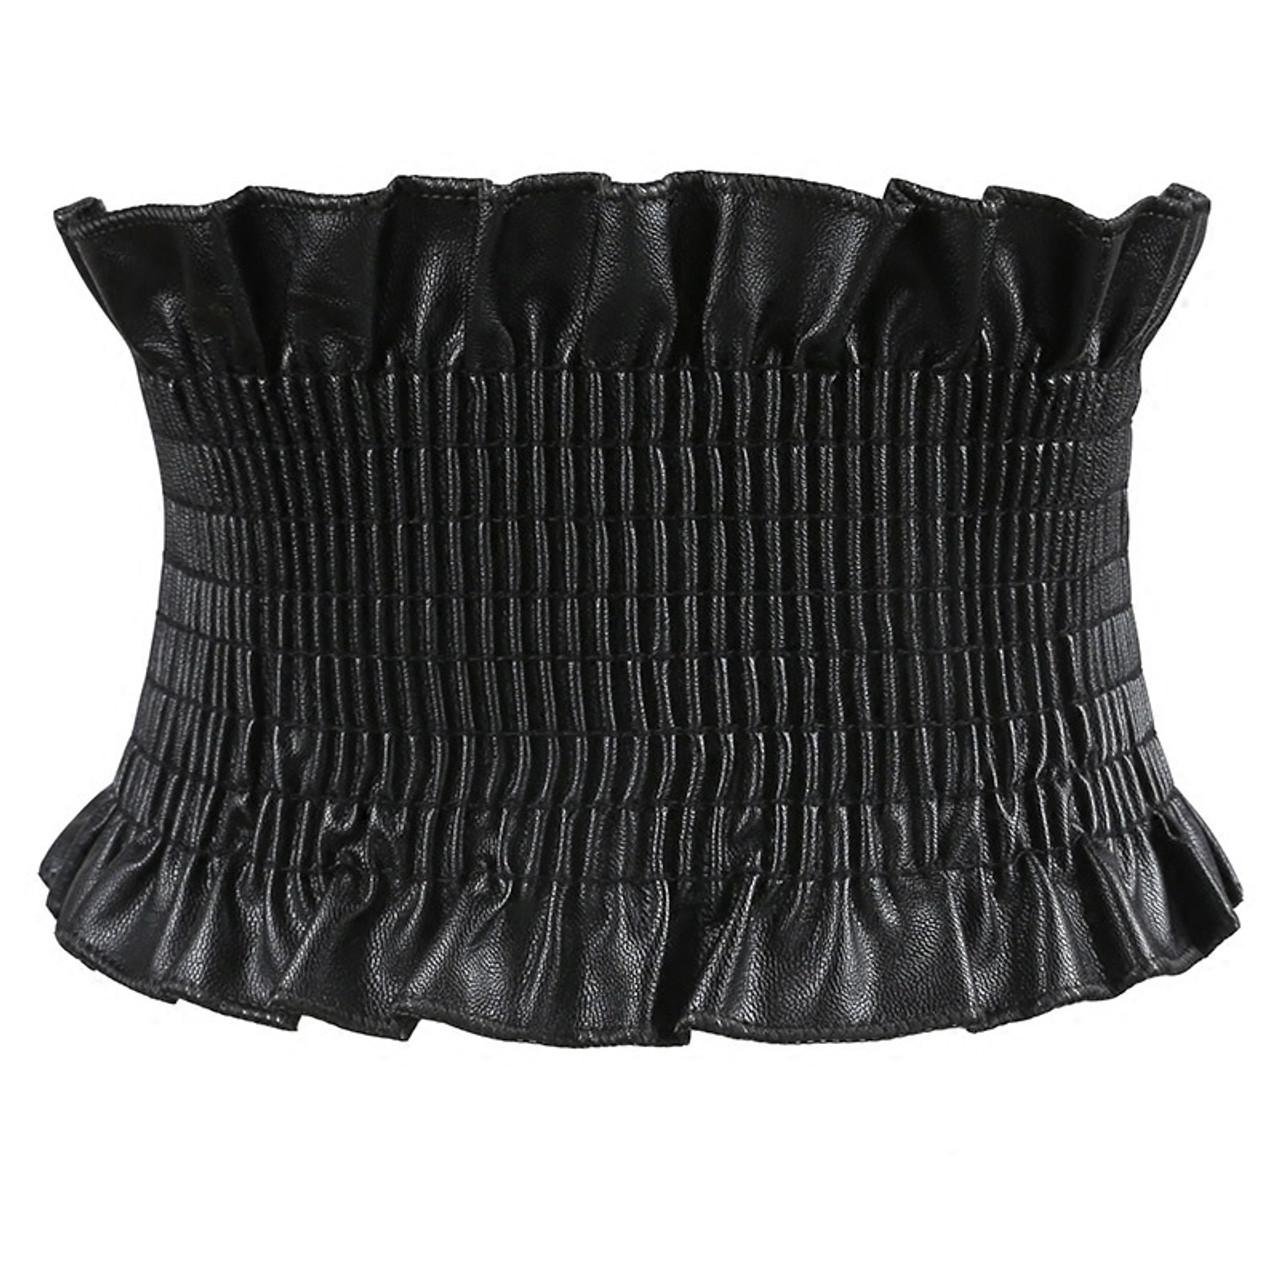 Lady Women Stylish Wide Belt Elastic Stretch Faux Leather Dress Waist Band NEW